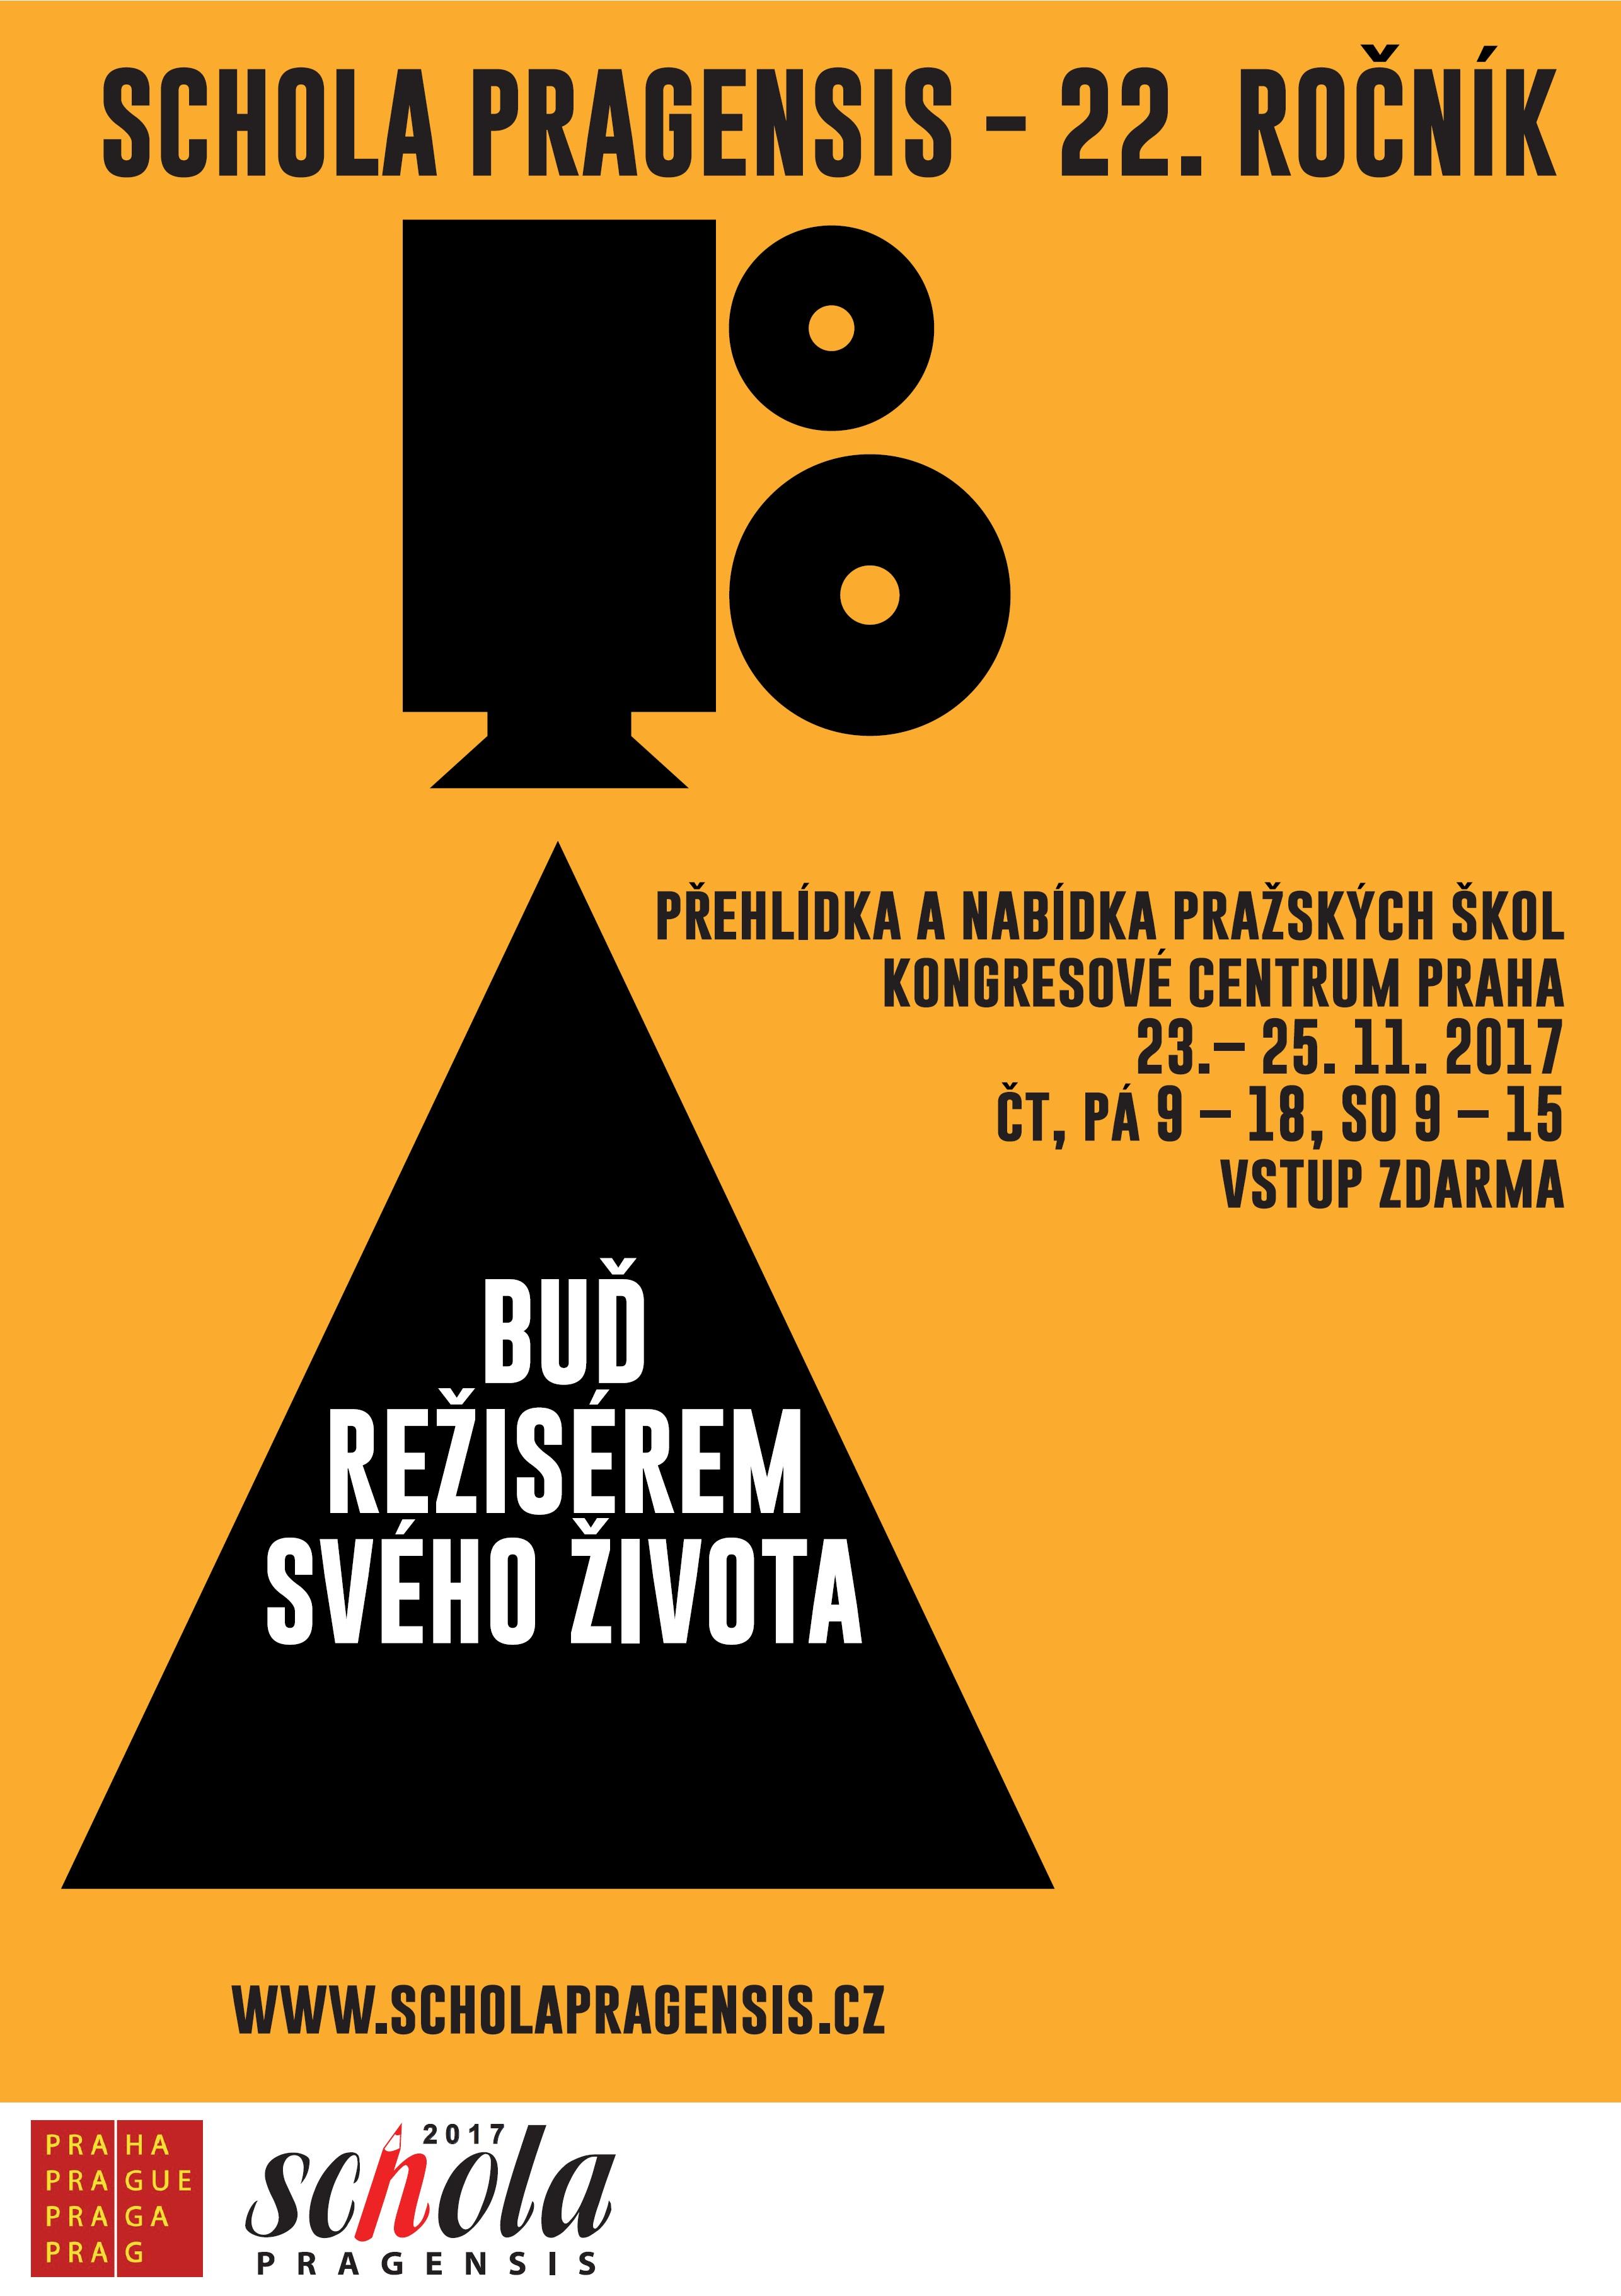 bud-reziserem-sveho-zivota-schola-pragensis-2017